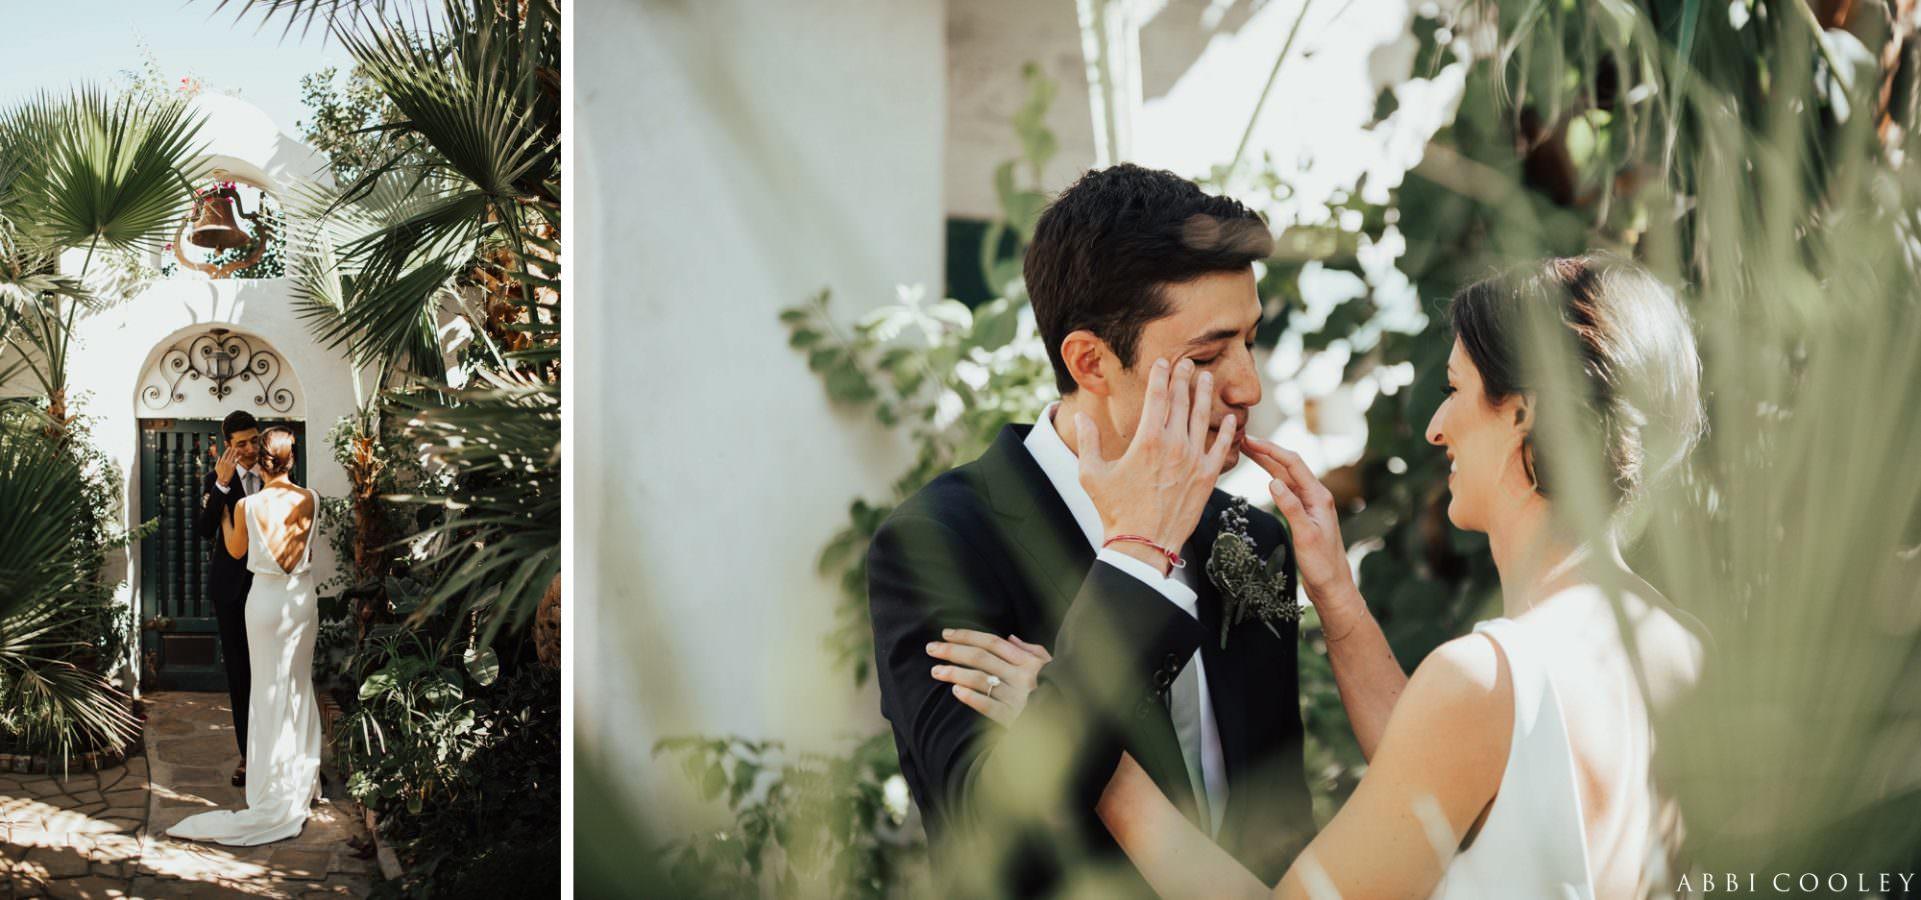 ABBI COOLEY PALM SPRINGS WEDDING_0785